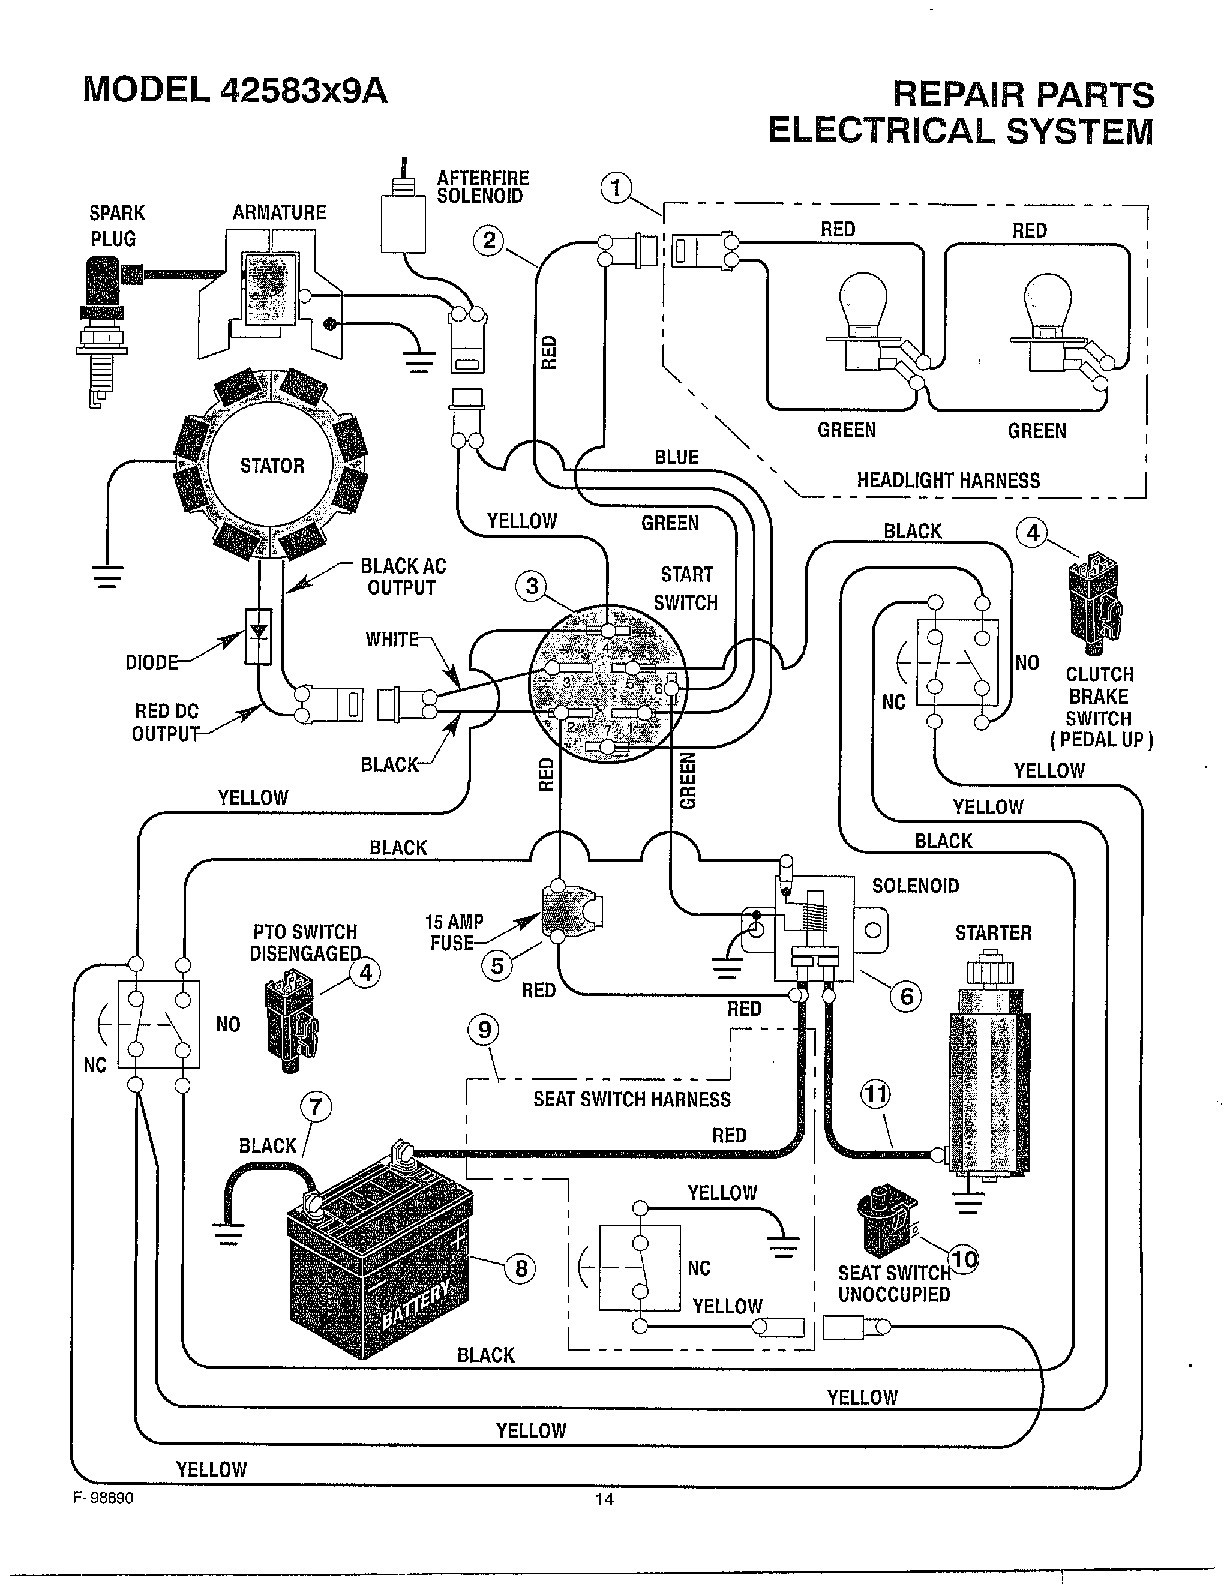 allis chalmers lawn mower wiring diagram wiring diagram New Allis Chalmers Lawn Mowers allis chalmers lawn mower wiring diagram 5 6 petraoberheit de \\u2022lawn mower engine wiring diagram